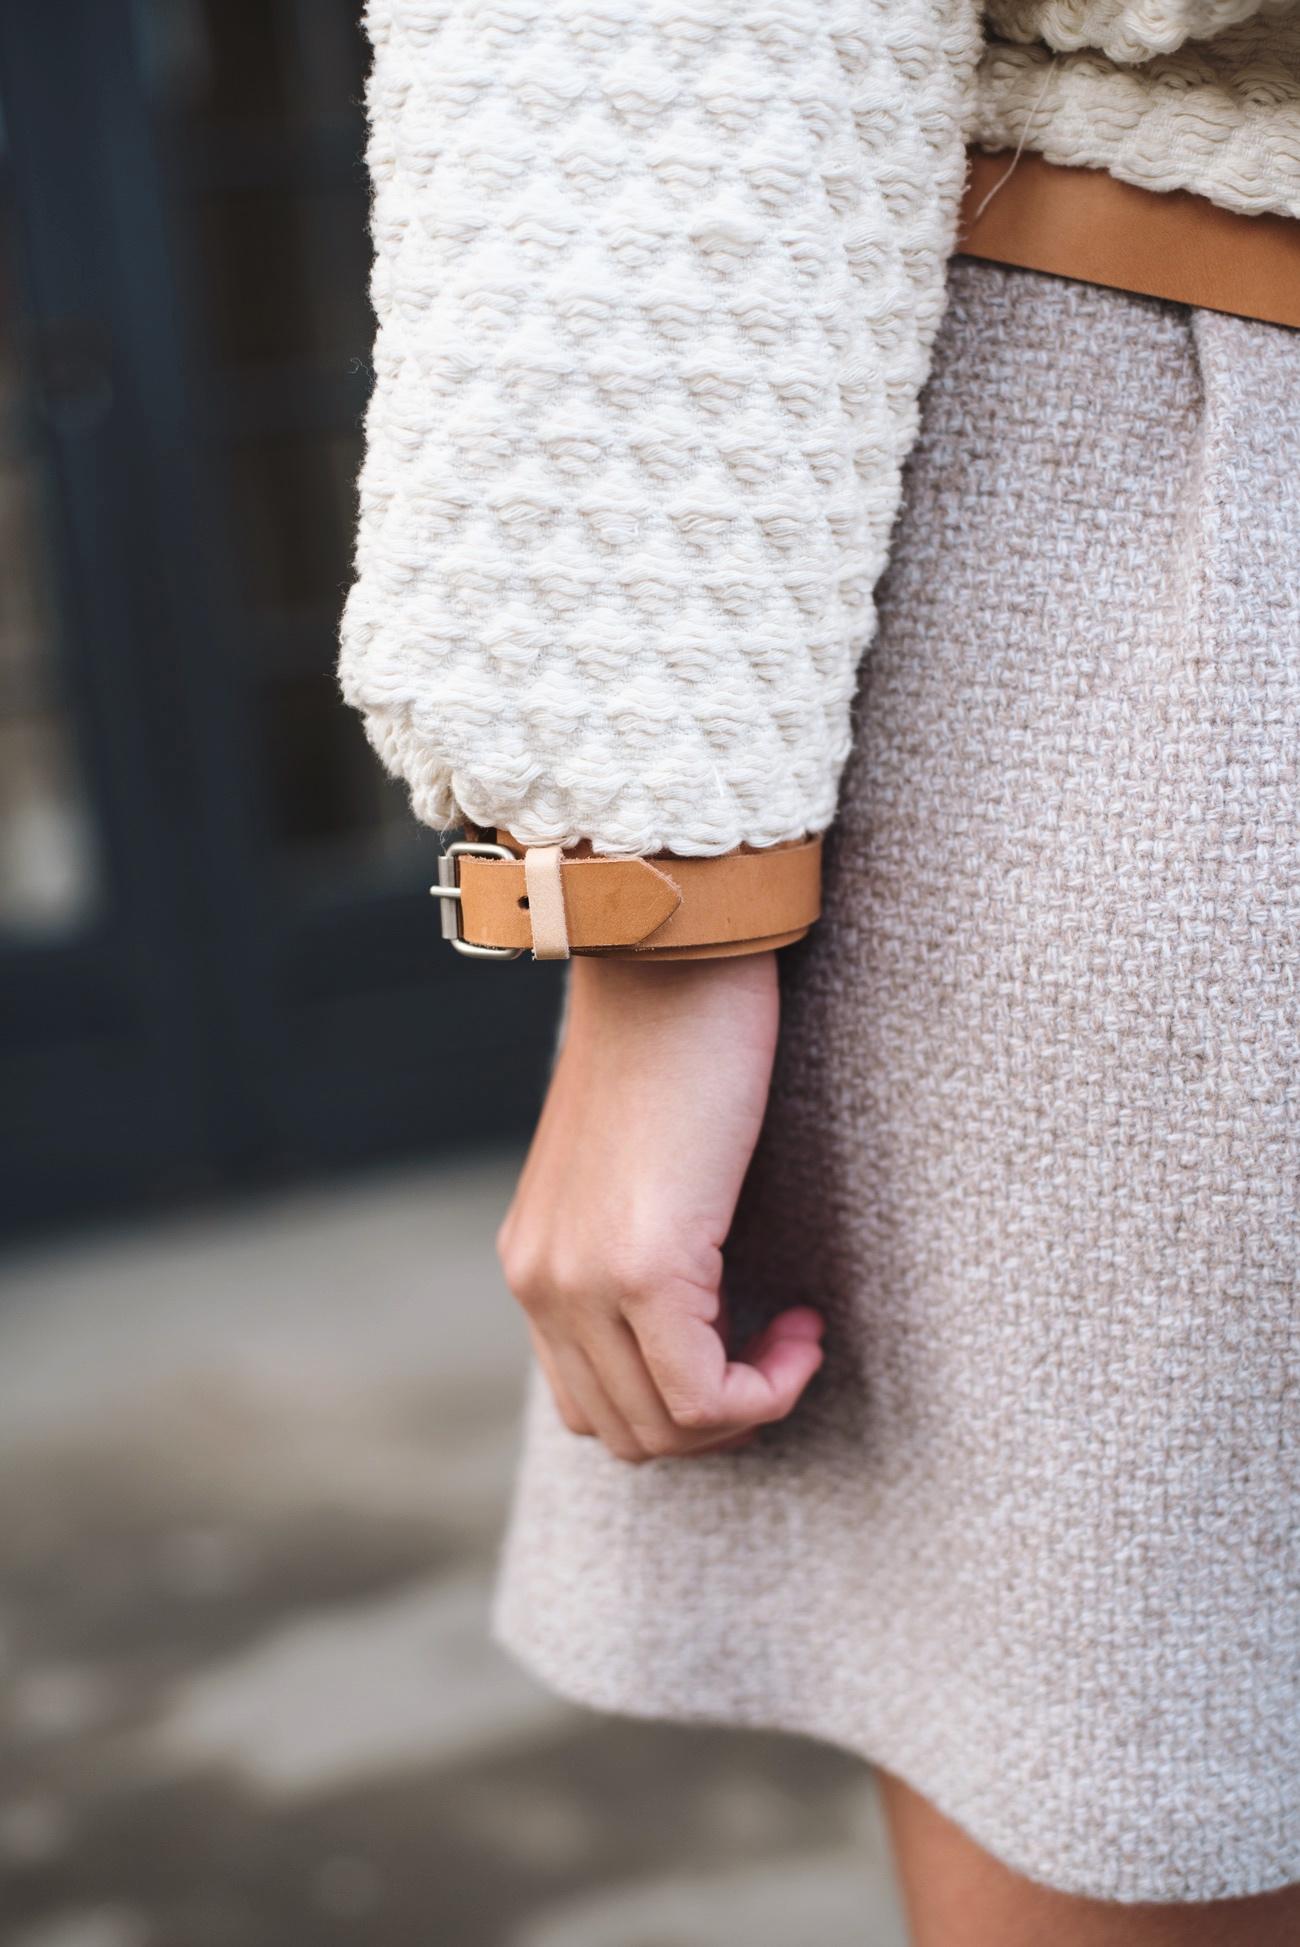 schnallen-details-im-outfit-buckle-details-fashion-trend-fashiioncarpet